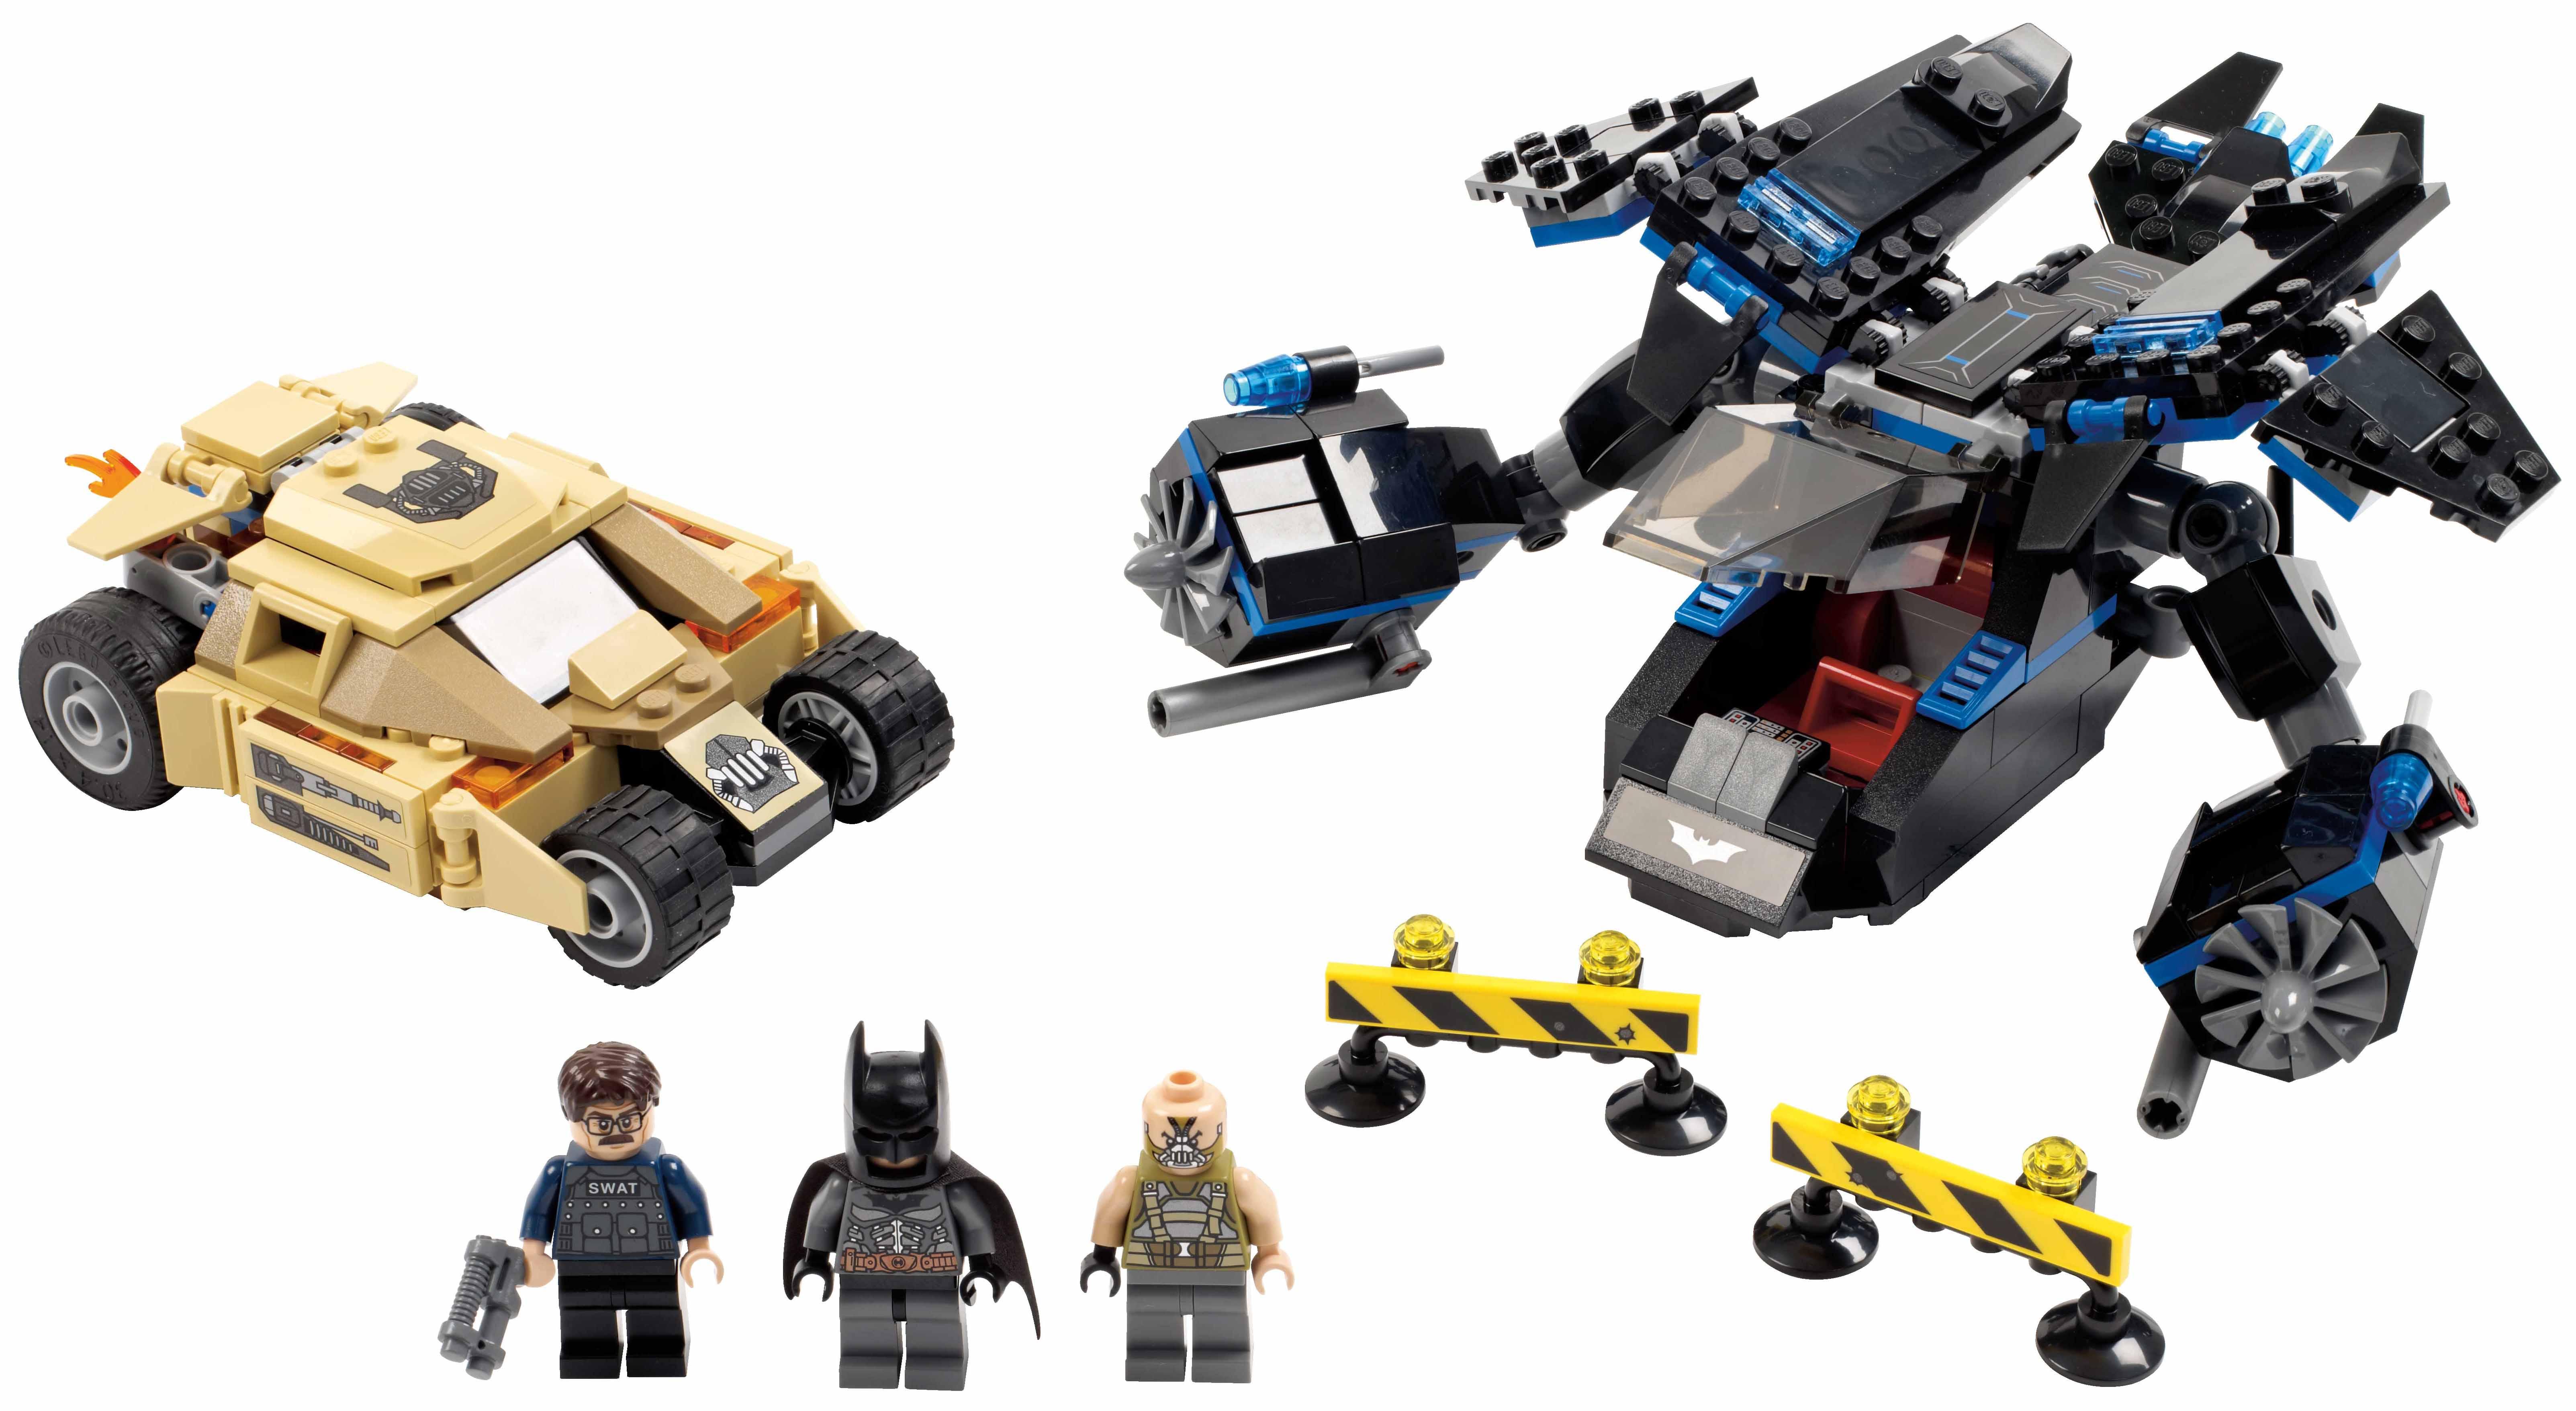 lego dark knight rises sets -#main